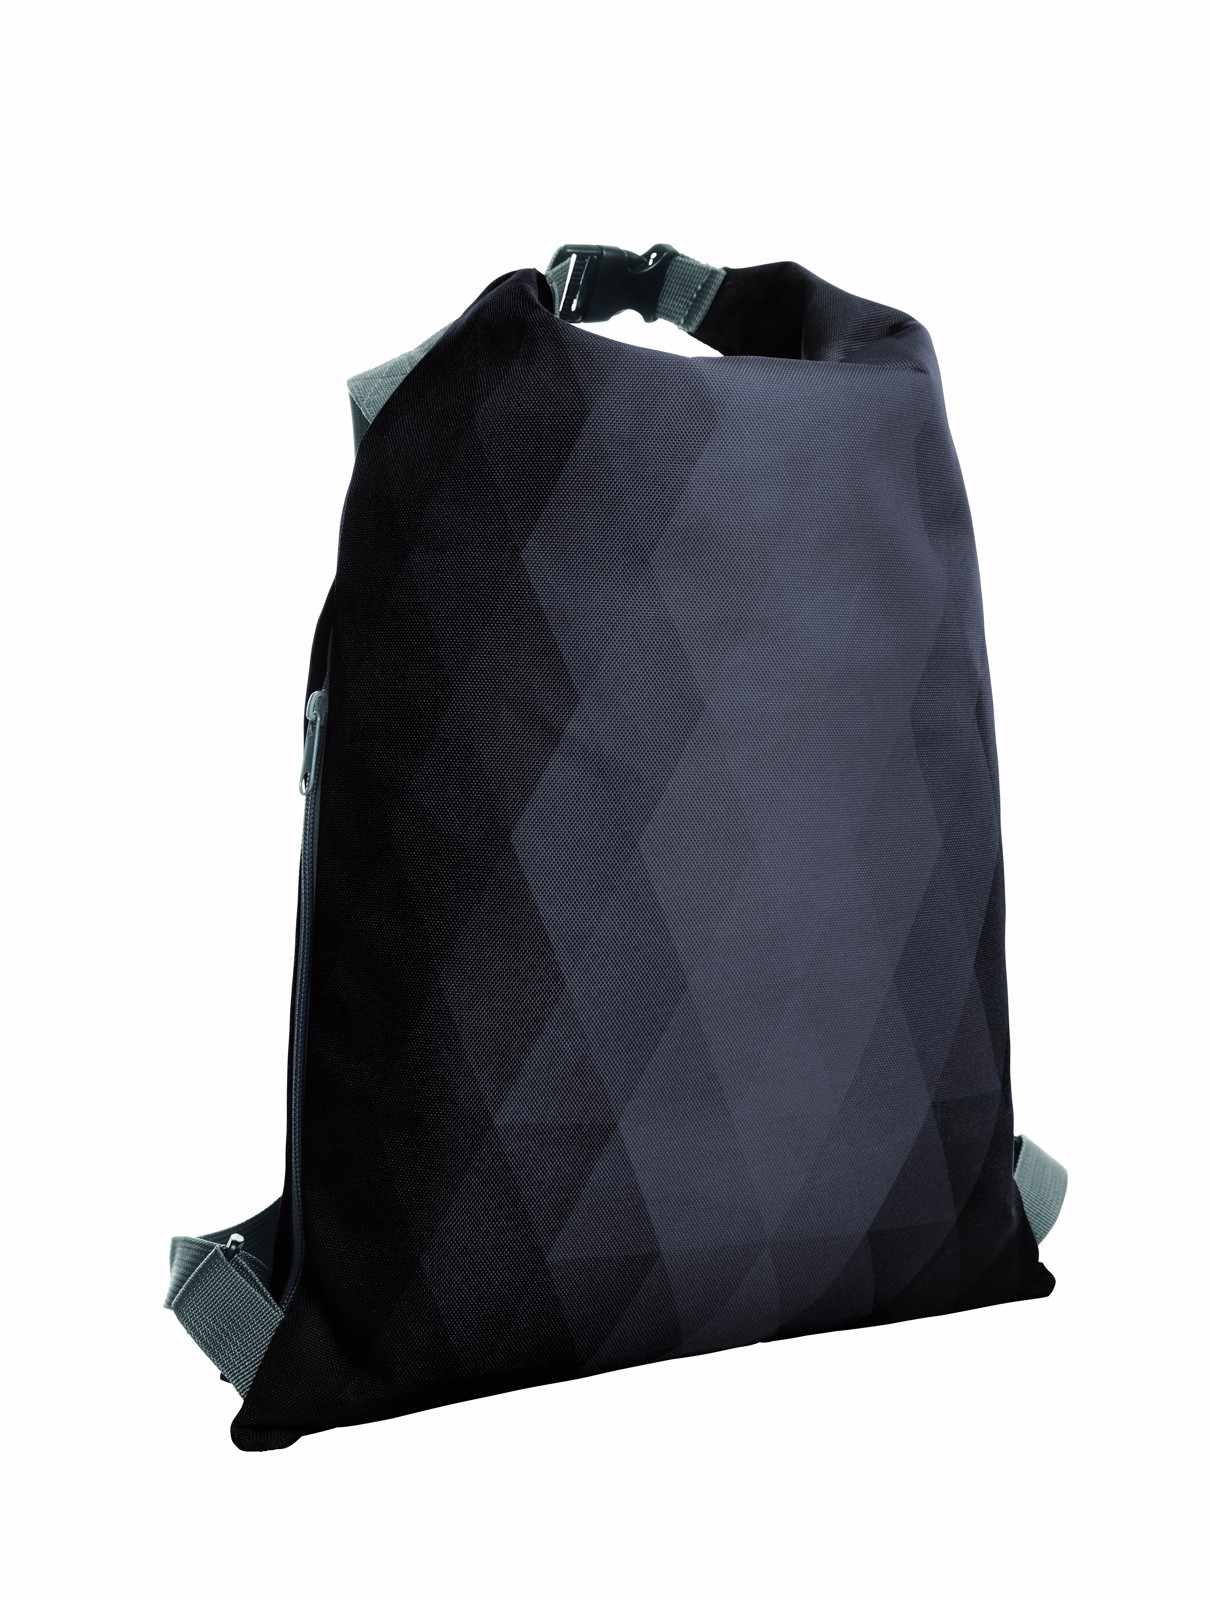 Batoh Diamond - Černá